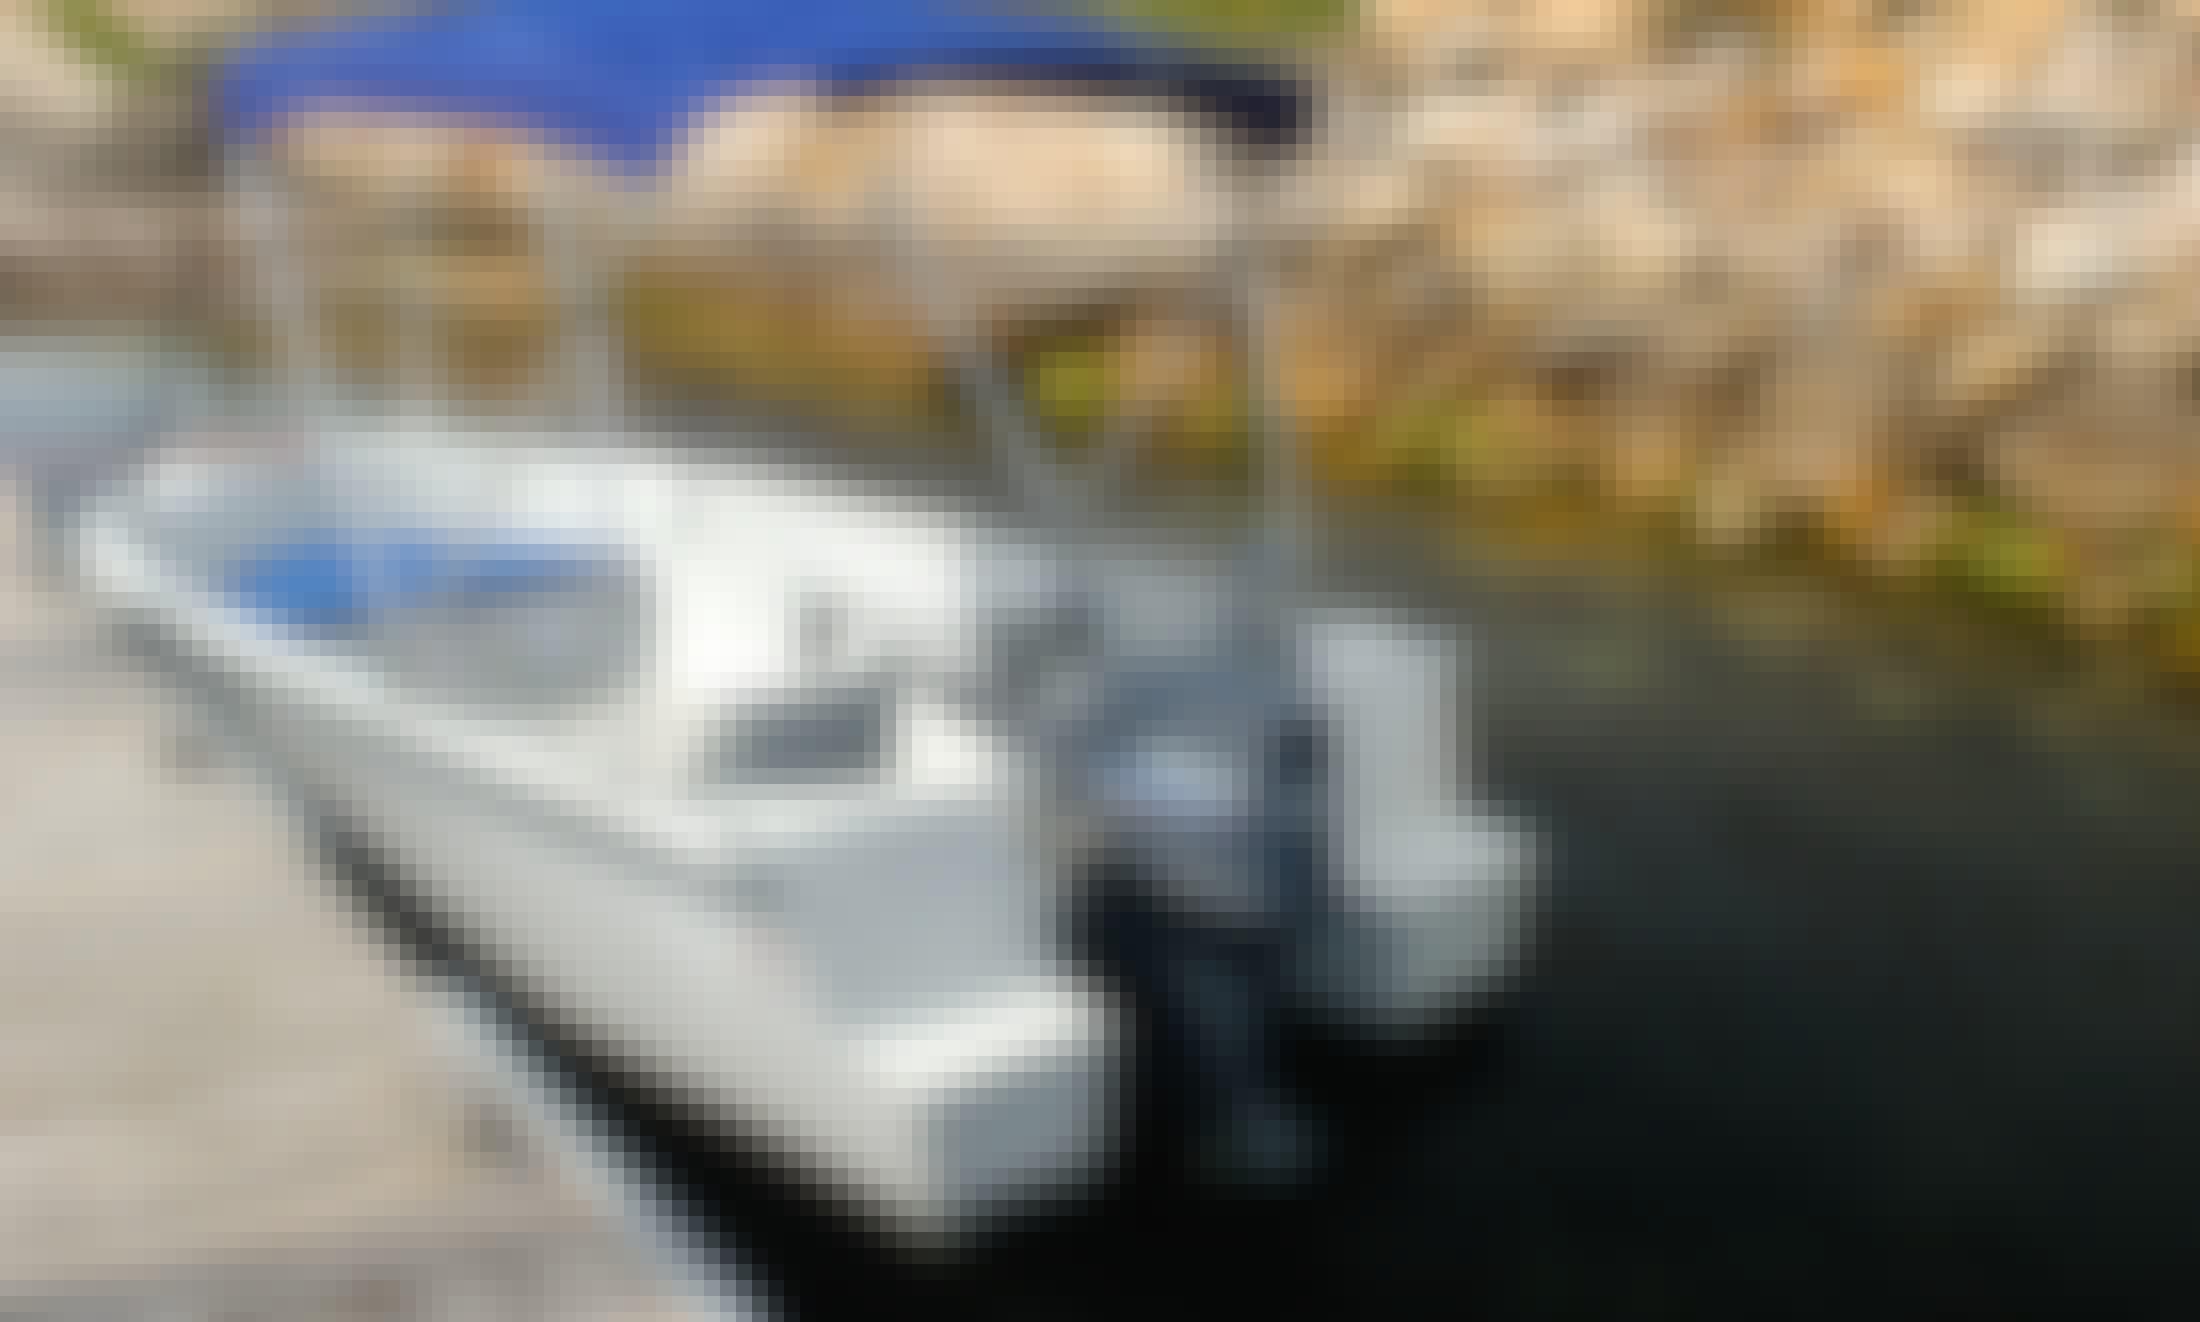 Dinghy rental in Mount Dutton Bay